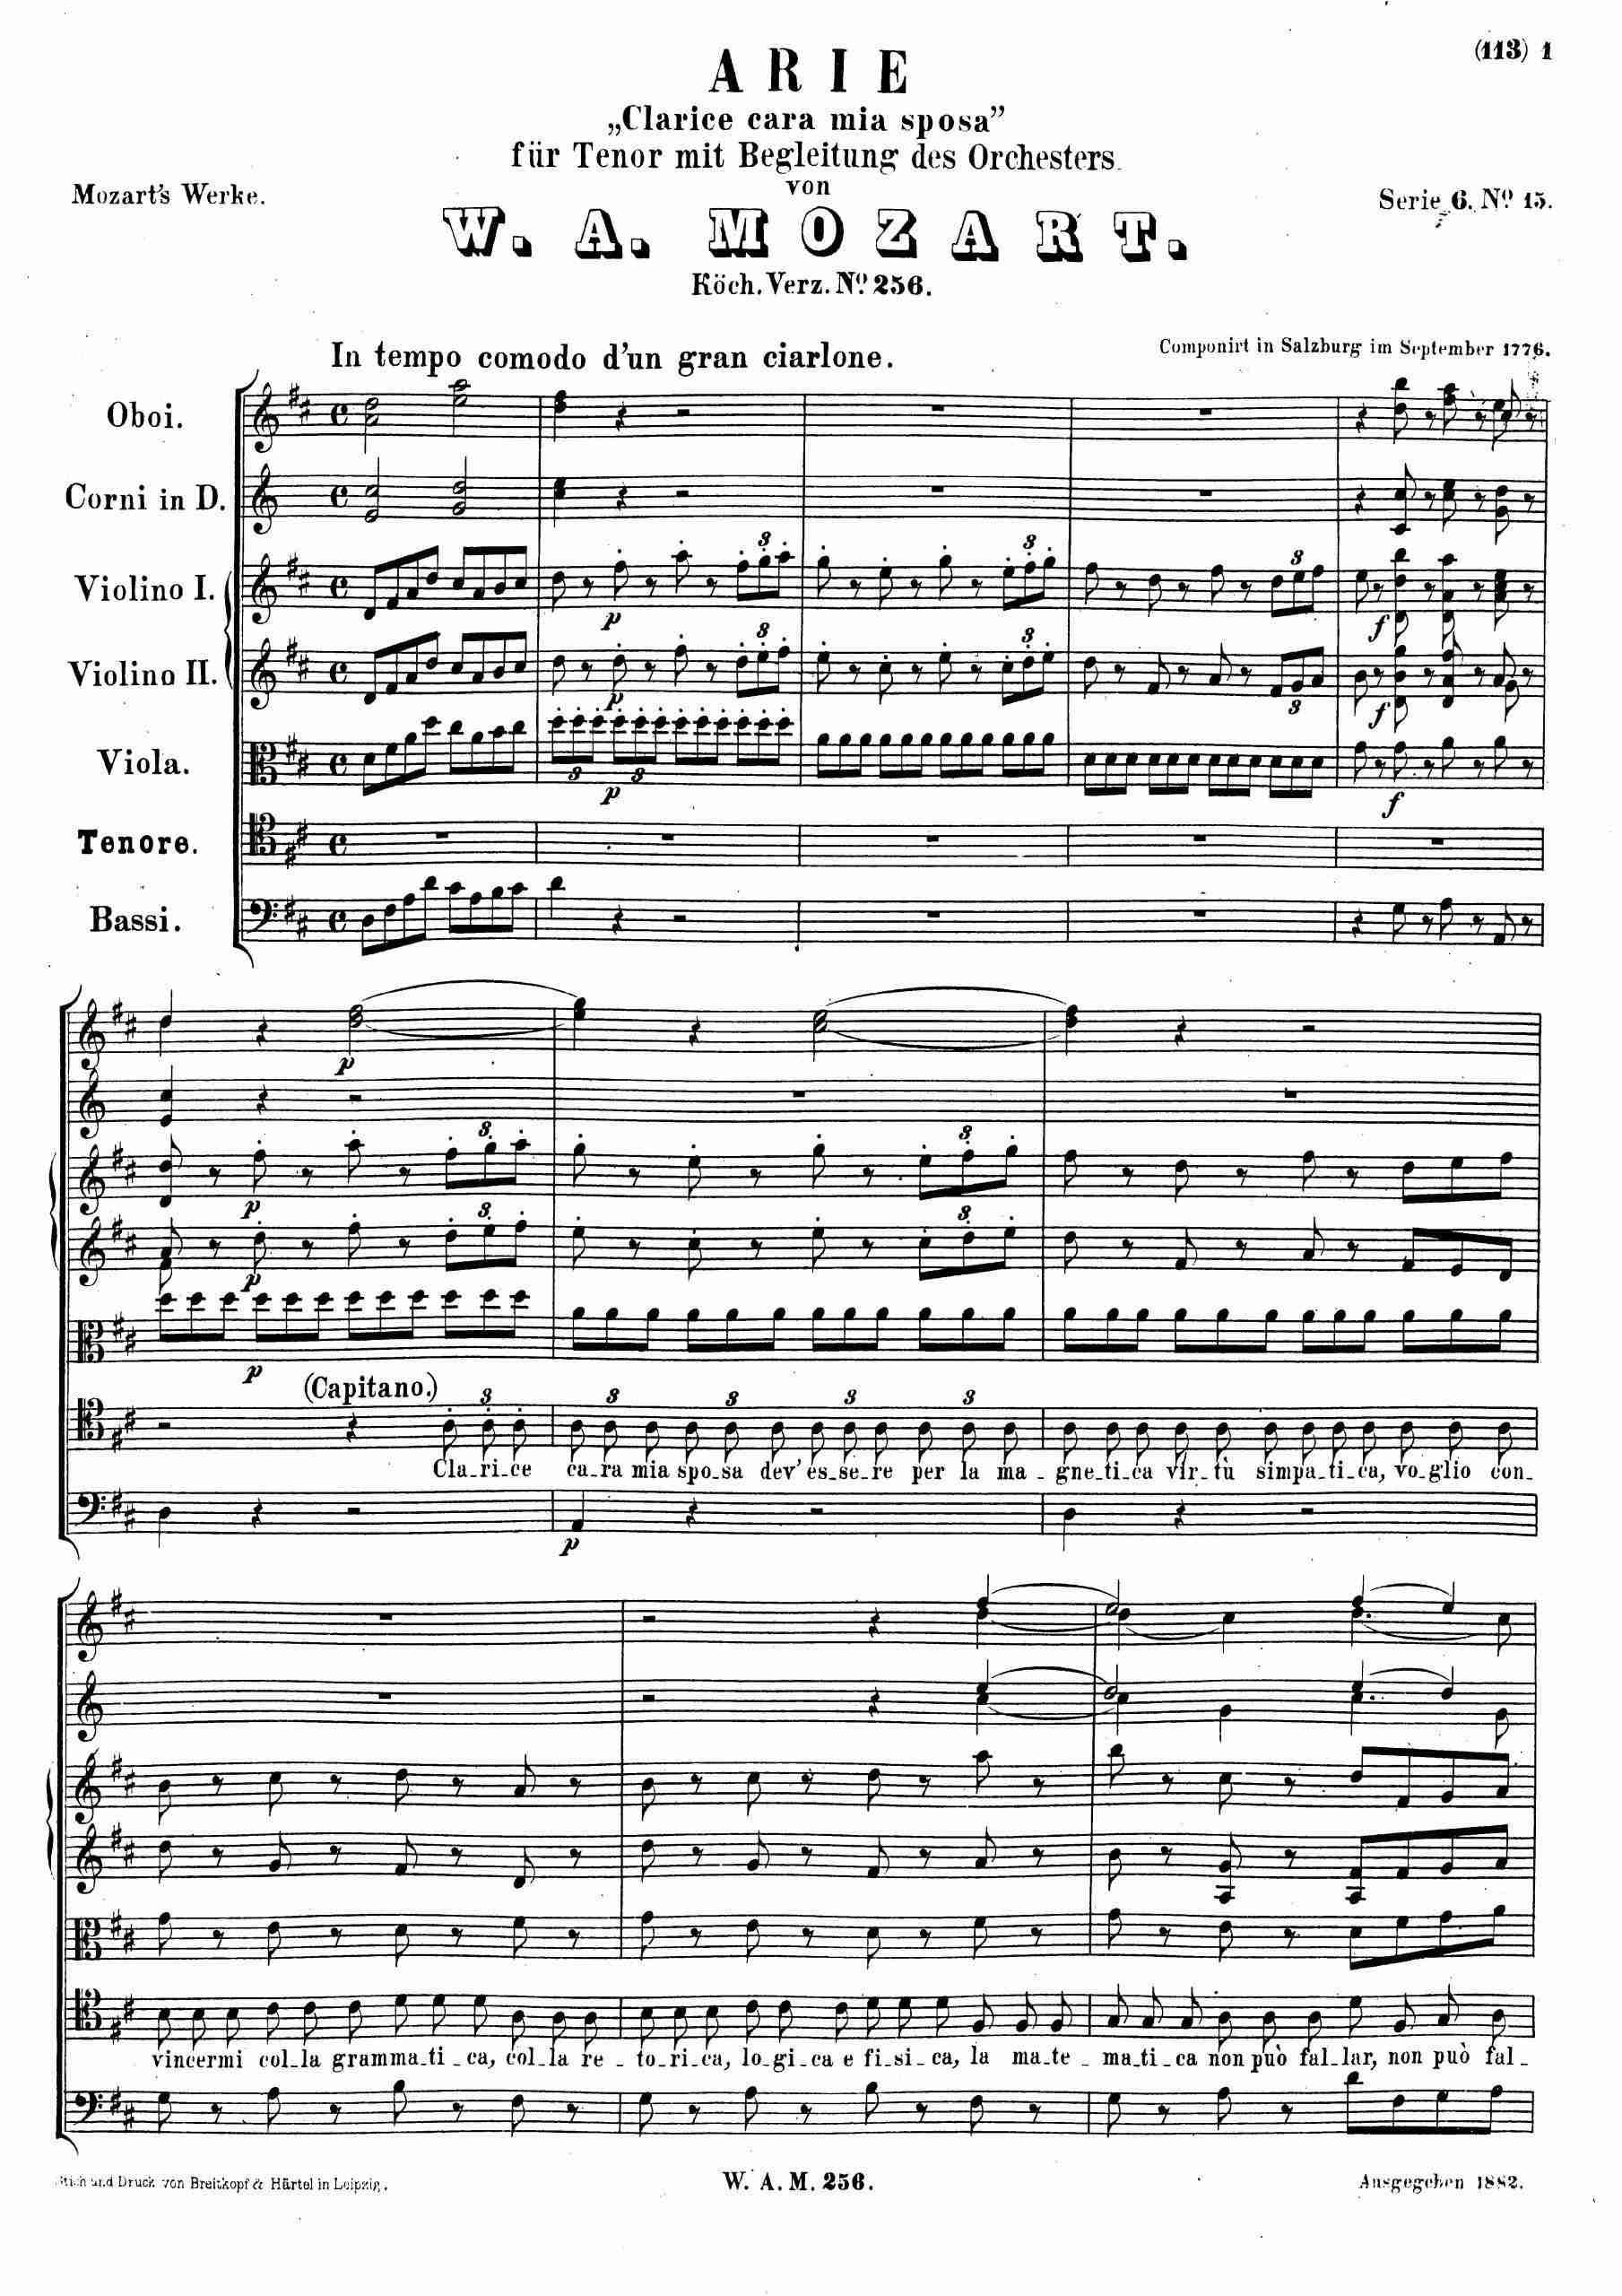 Mozart, Wolfgang Amadeus - Clarice cara mia sposa, K.256 (score)